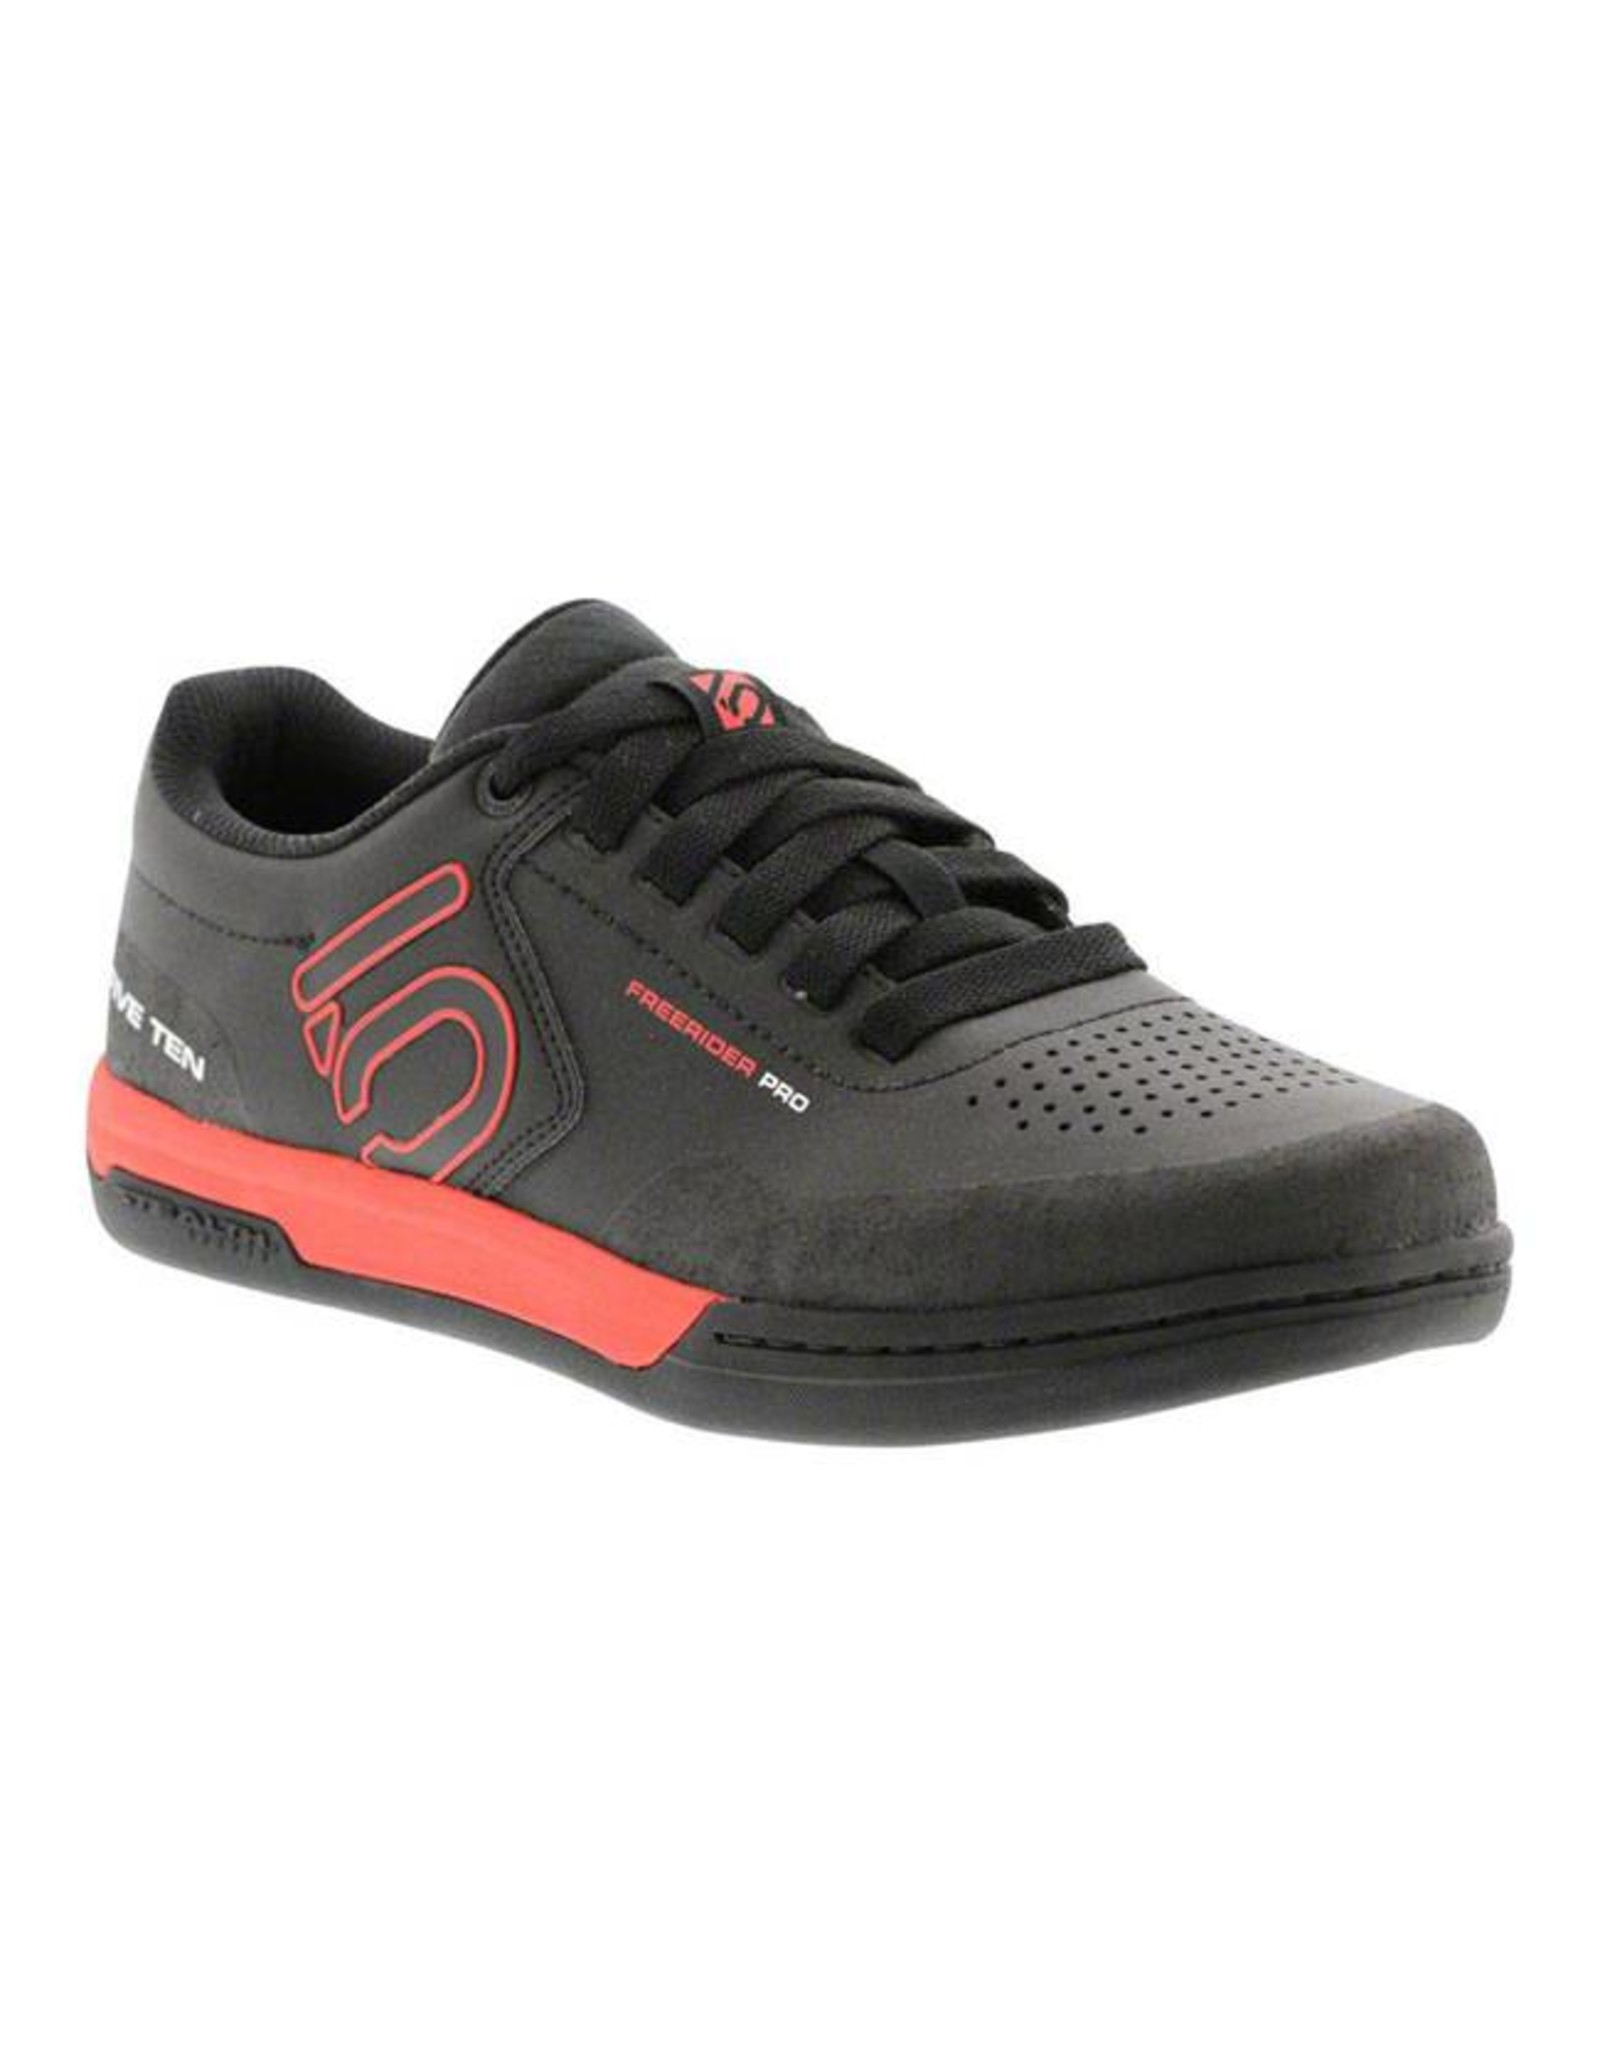 Five Ten Five Ten Freerider Pro Men's Flat Pedal Shoe: Black 7